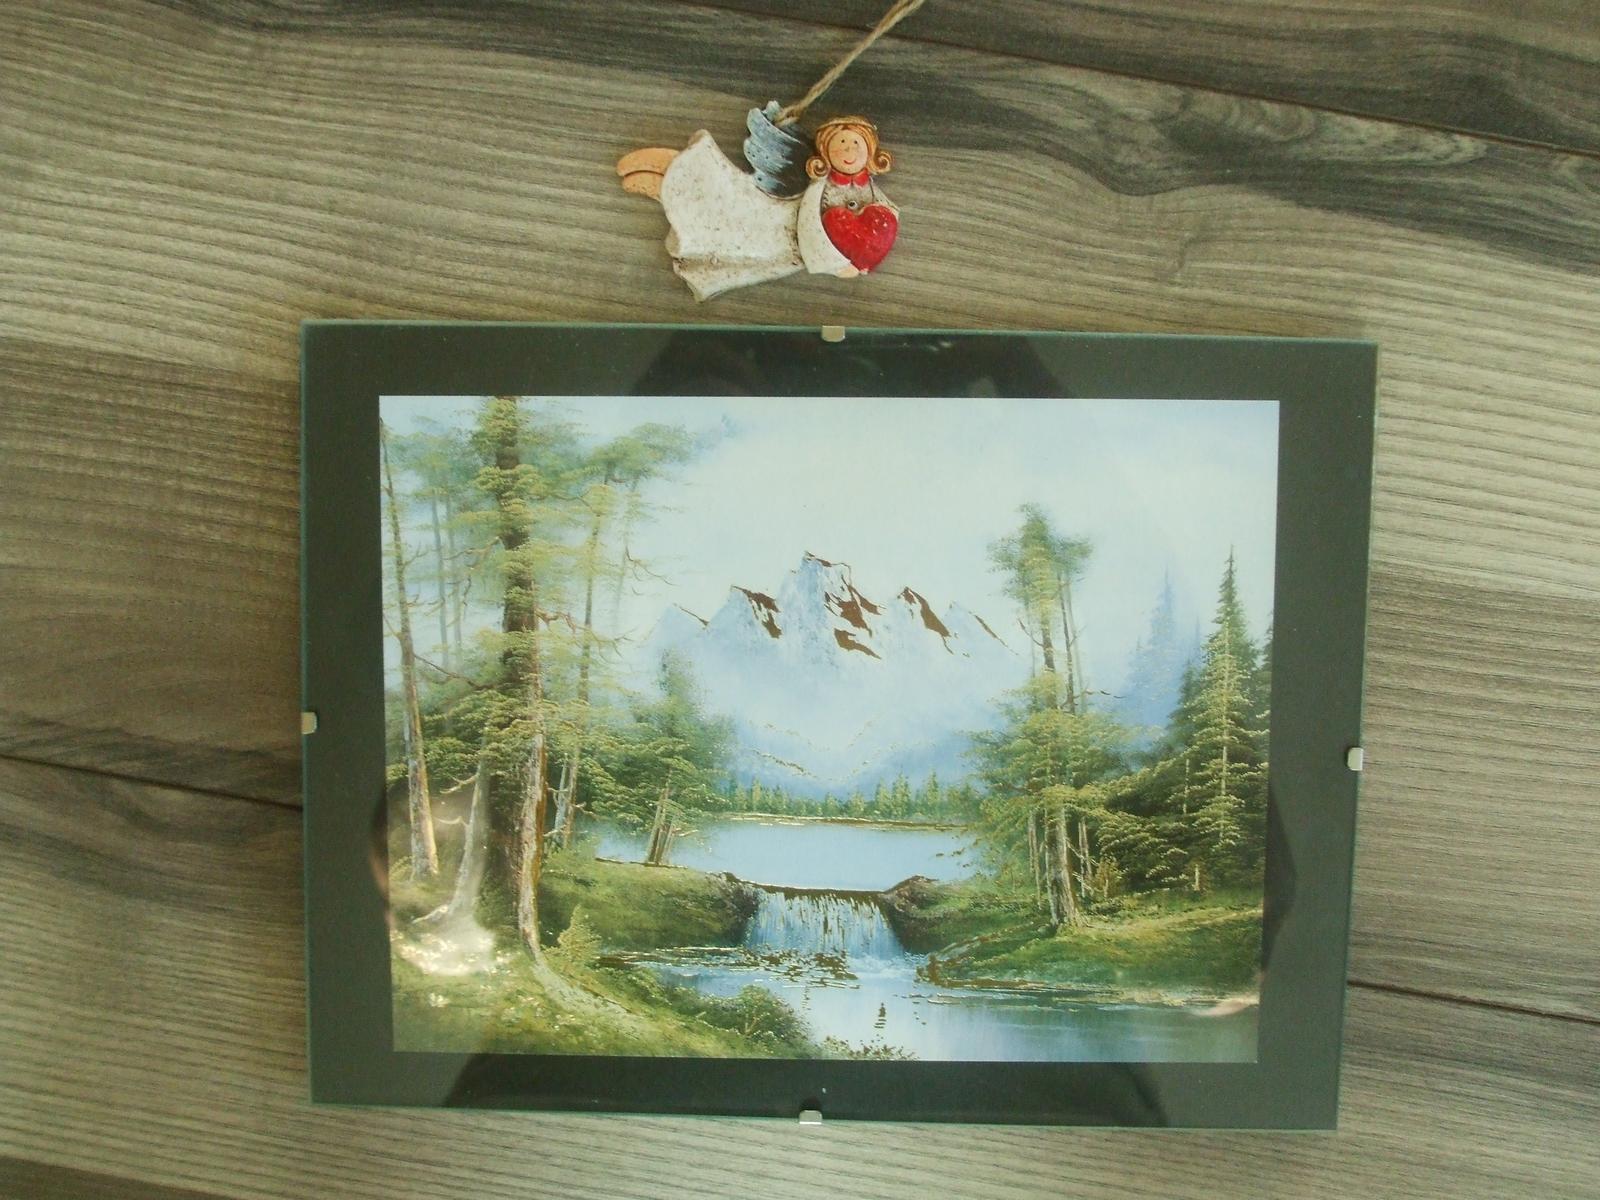 Obraz v skle 24 x 18 cm-top stav - Obrázok č. 4